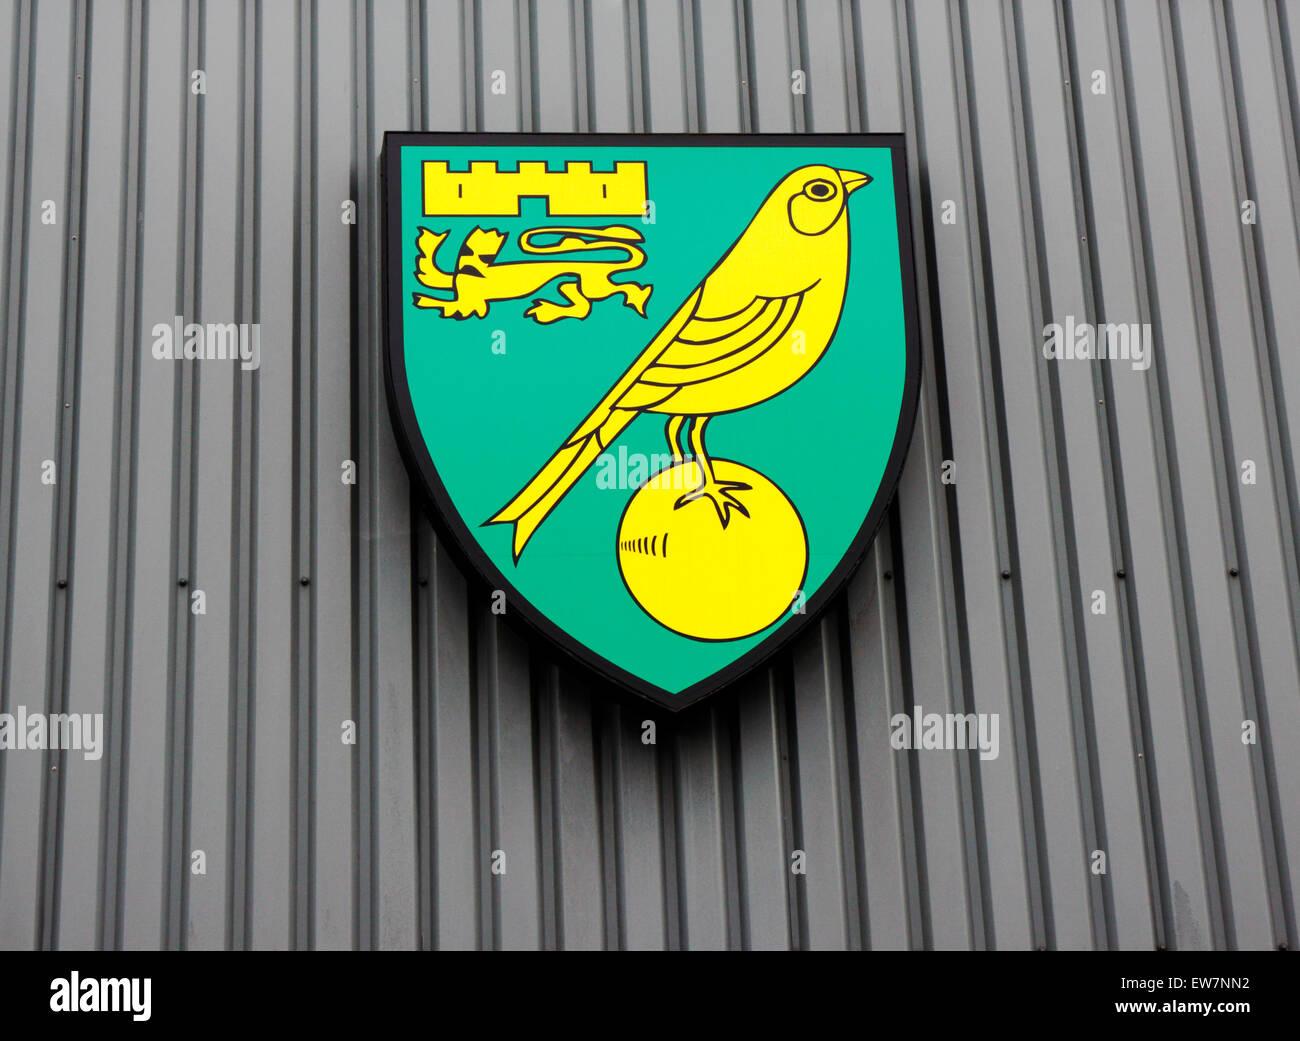 Norwich City Football Club badge outside Carrow Road ground, Norwich, Norfolk, England, United Kingdom. - Stock Image